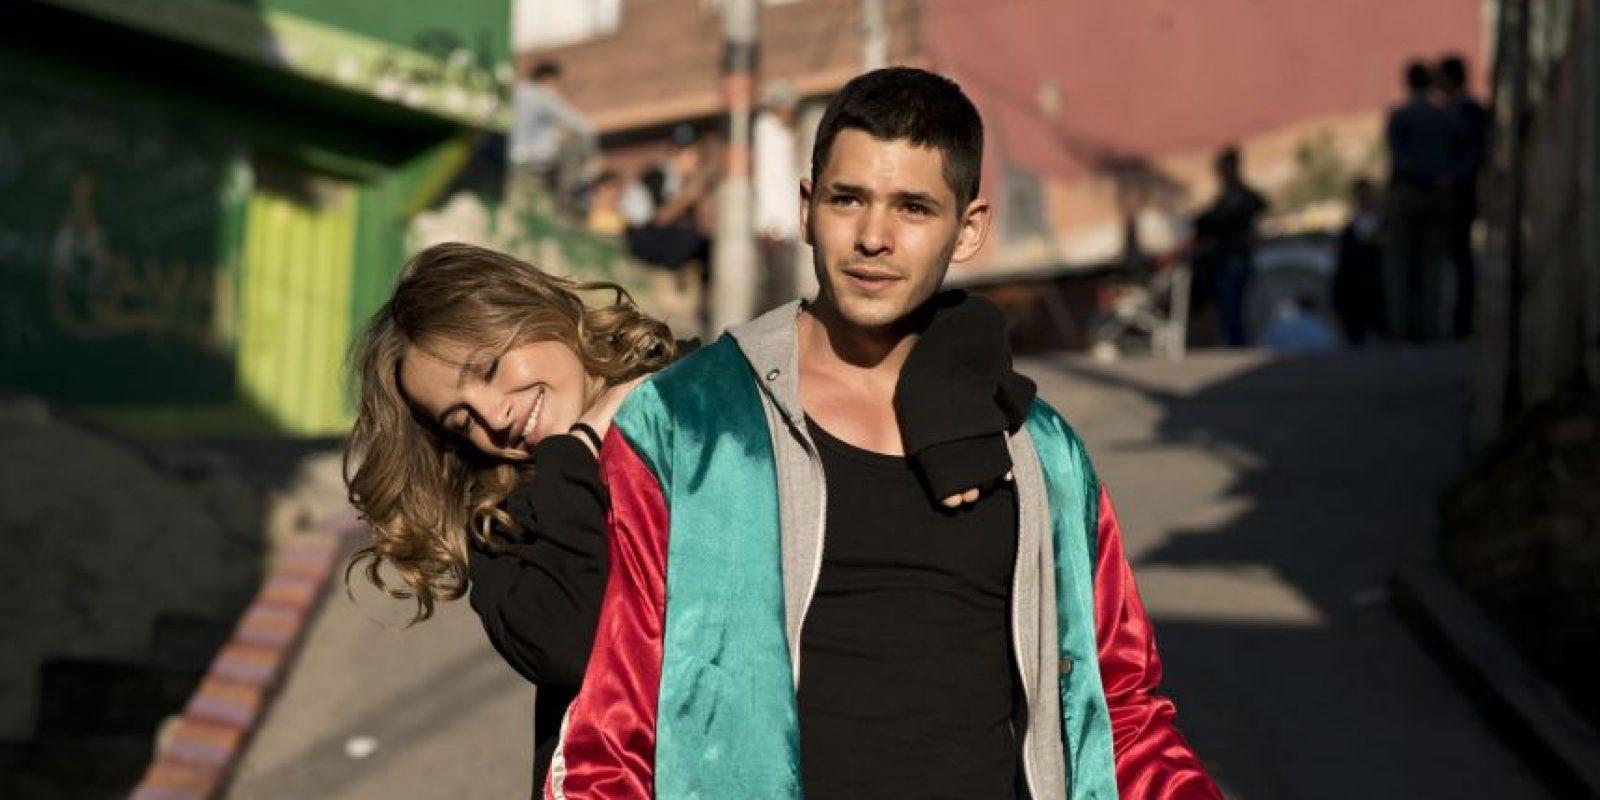 La historia ilustra la vida de los barrios latinoamericanos Foto:FOX